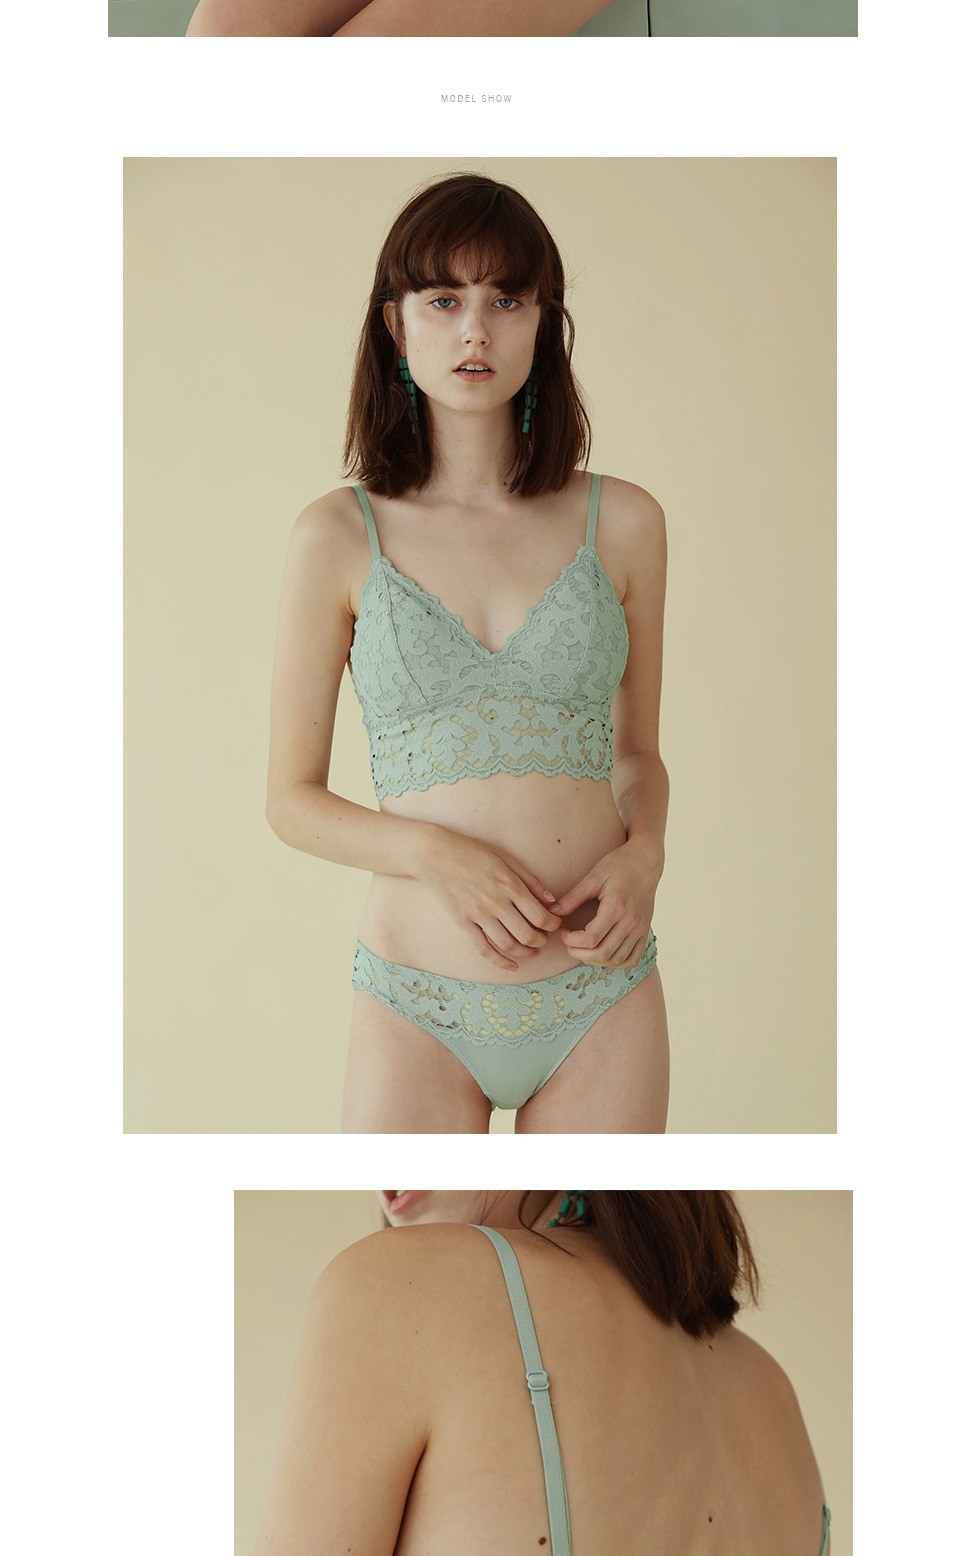 lace limitation lingerie French lace sexy bra Romantic Temptation Bra Set  Young Women deep V-neck push up Underwear Set Lade Bra c354e1084